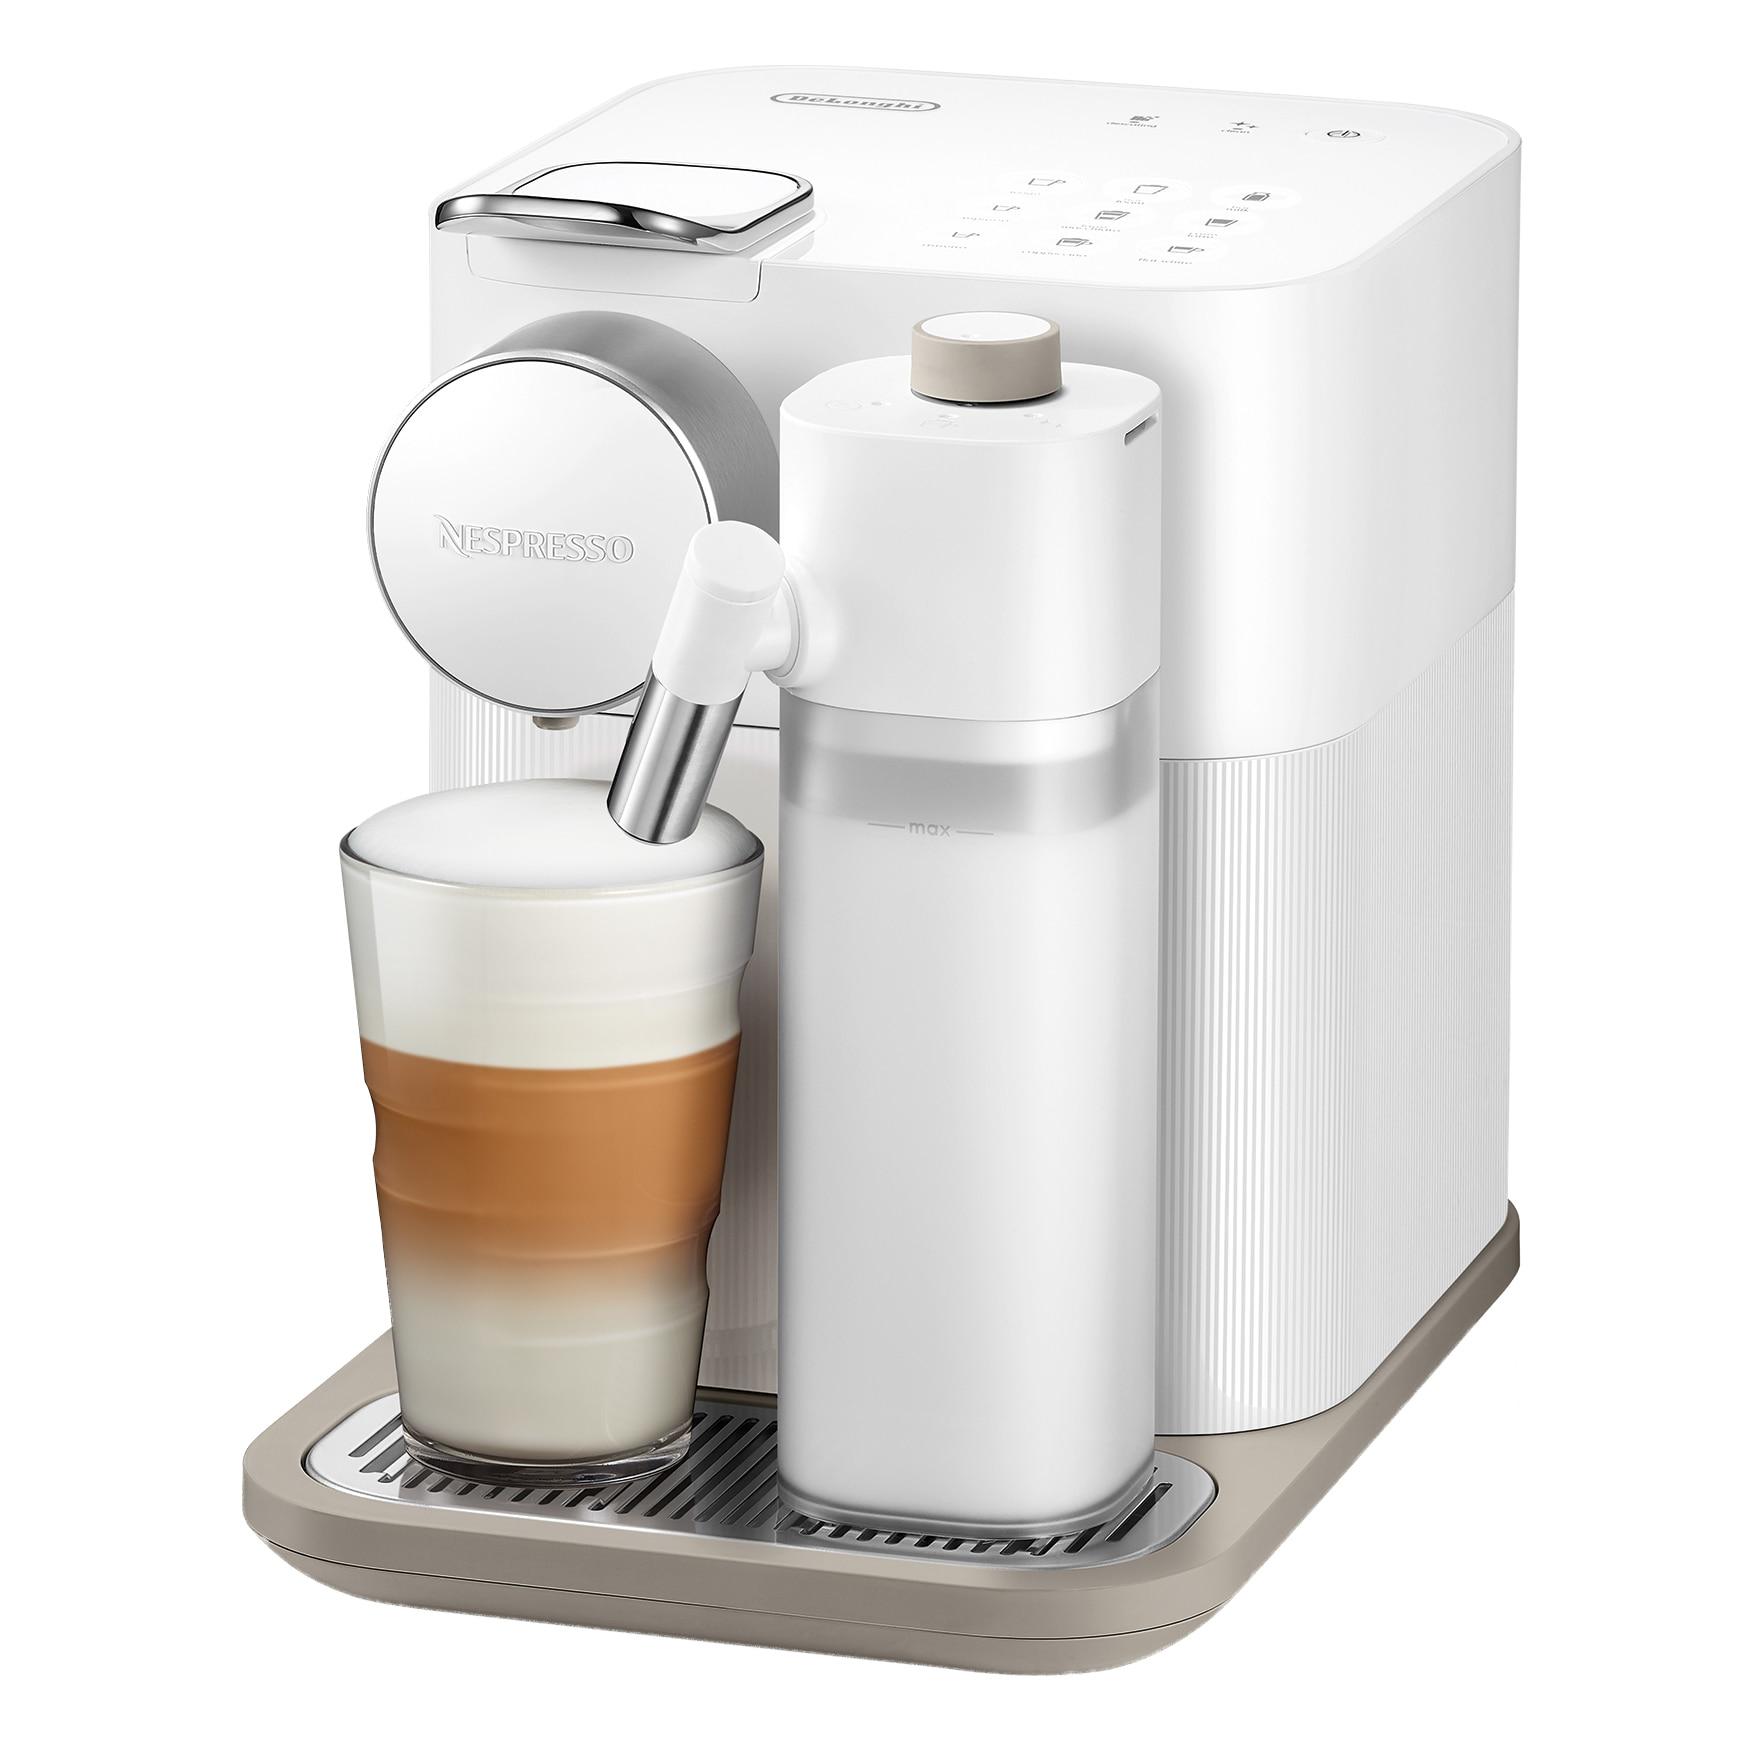 Fotografie Espressor Nespresso Gran Lattissima EN650.WH, 1400 W, 1.3 L, 19 bar, Alb + 14 capsule cadou